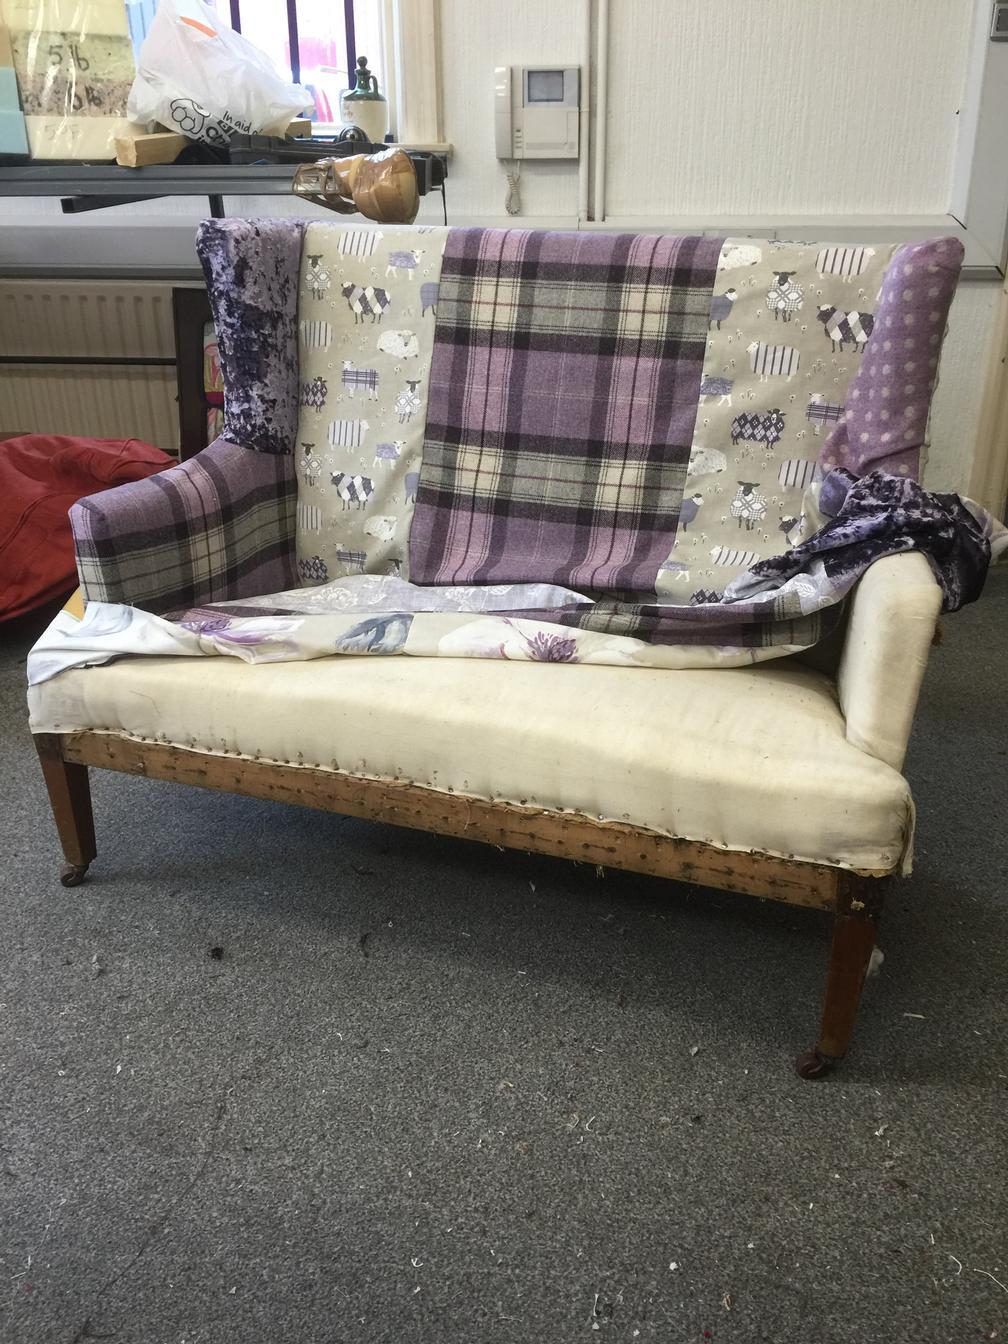 How To Measure A Sofa For Loose Covers Brokeasshome Com